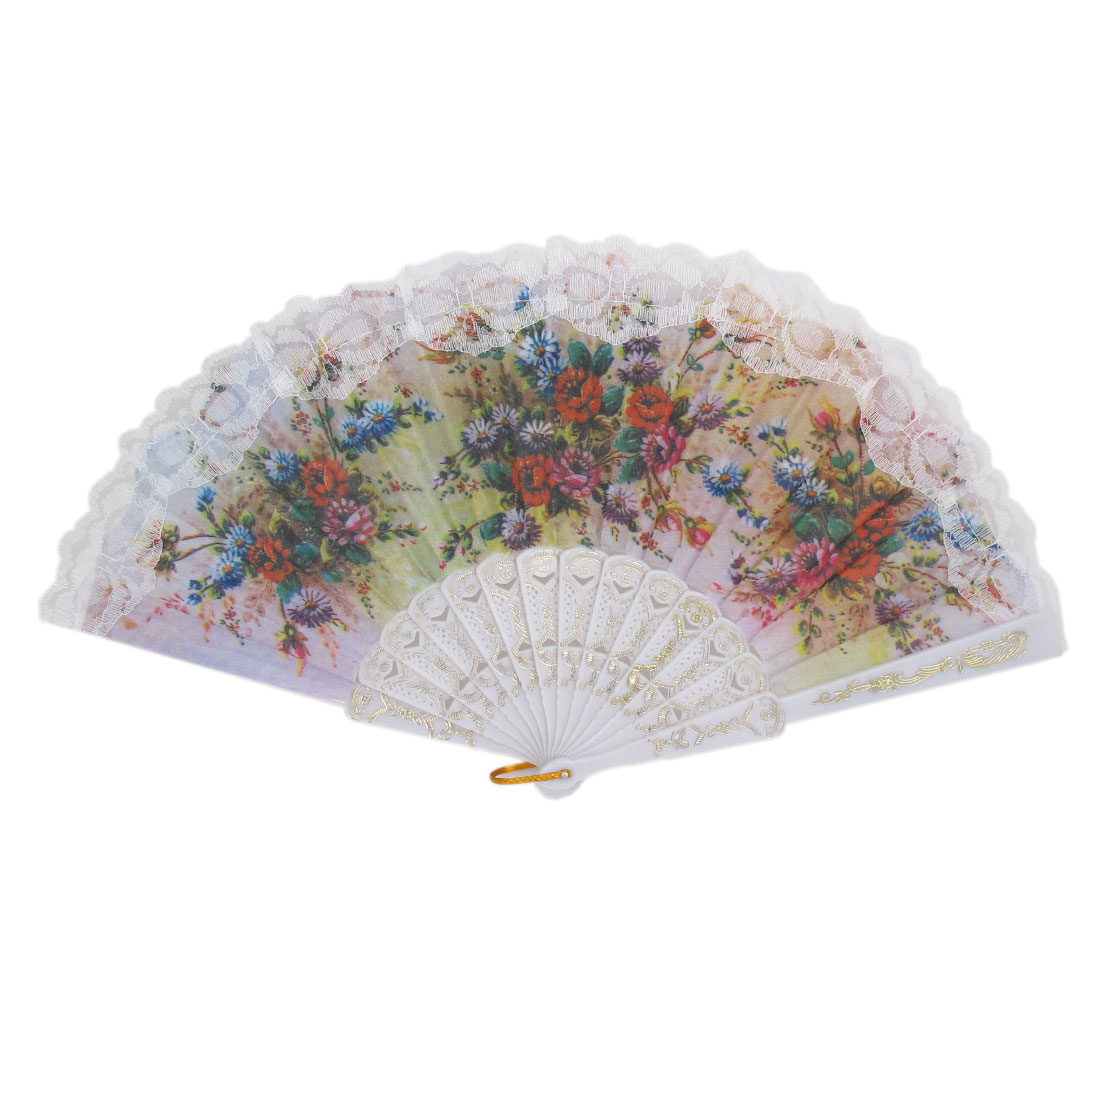 Wedding Party Gift Plastic Frame Lace Detail Flower Pattern Folding Hand Fan White